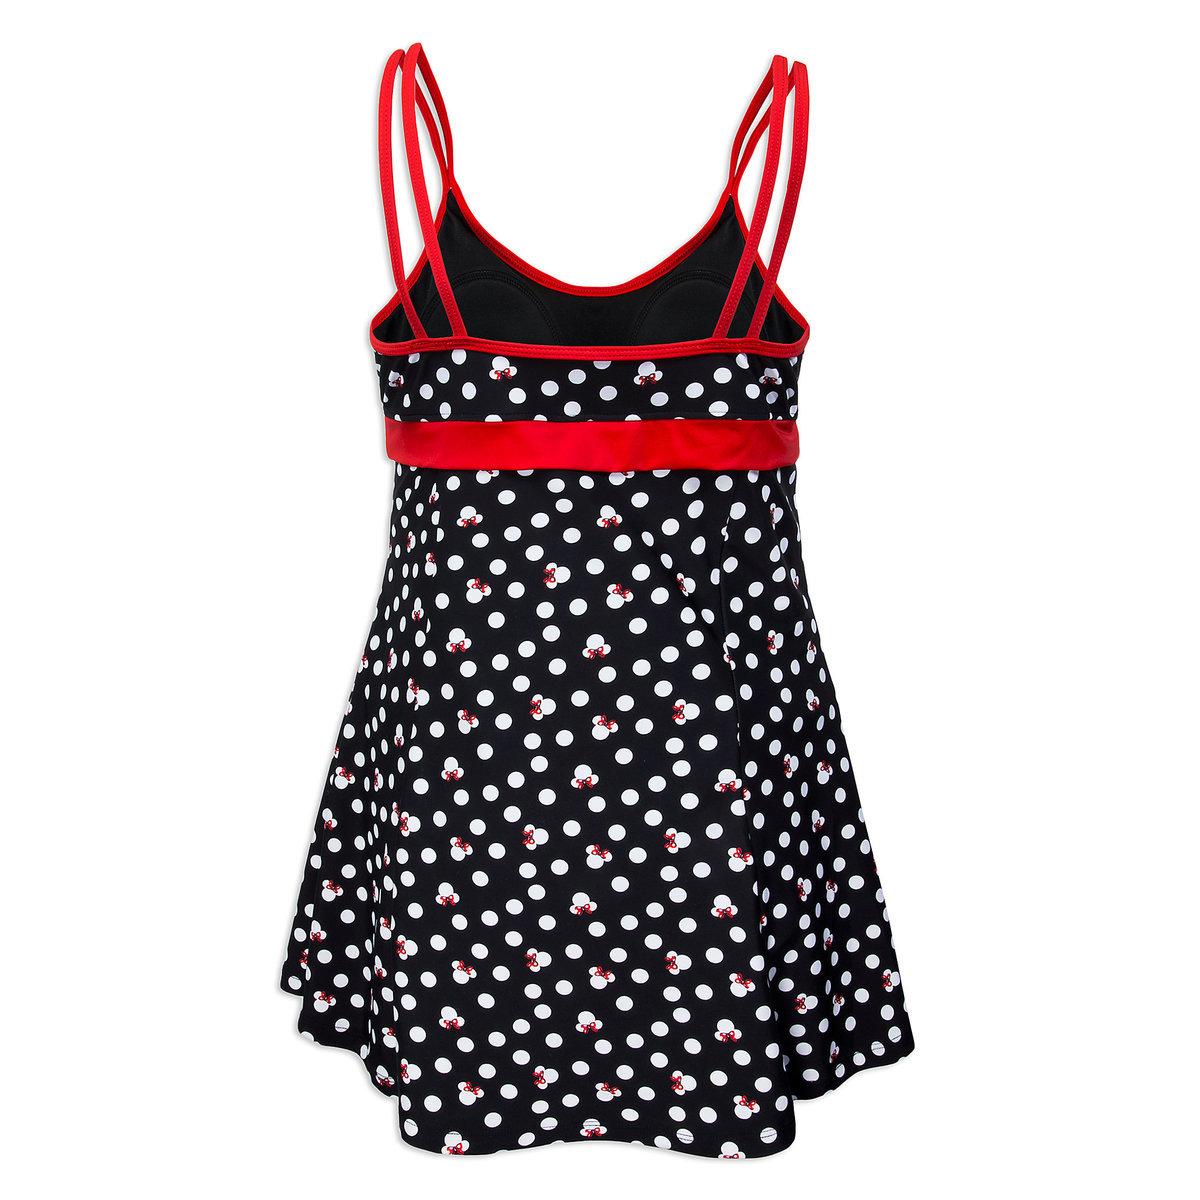 fb991c490 Disney Women's Swimsuit Dress - Minnie Mouse Icons Polka-dot Print